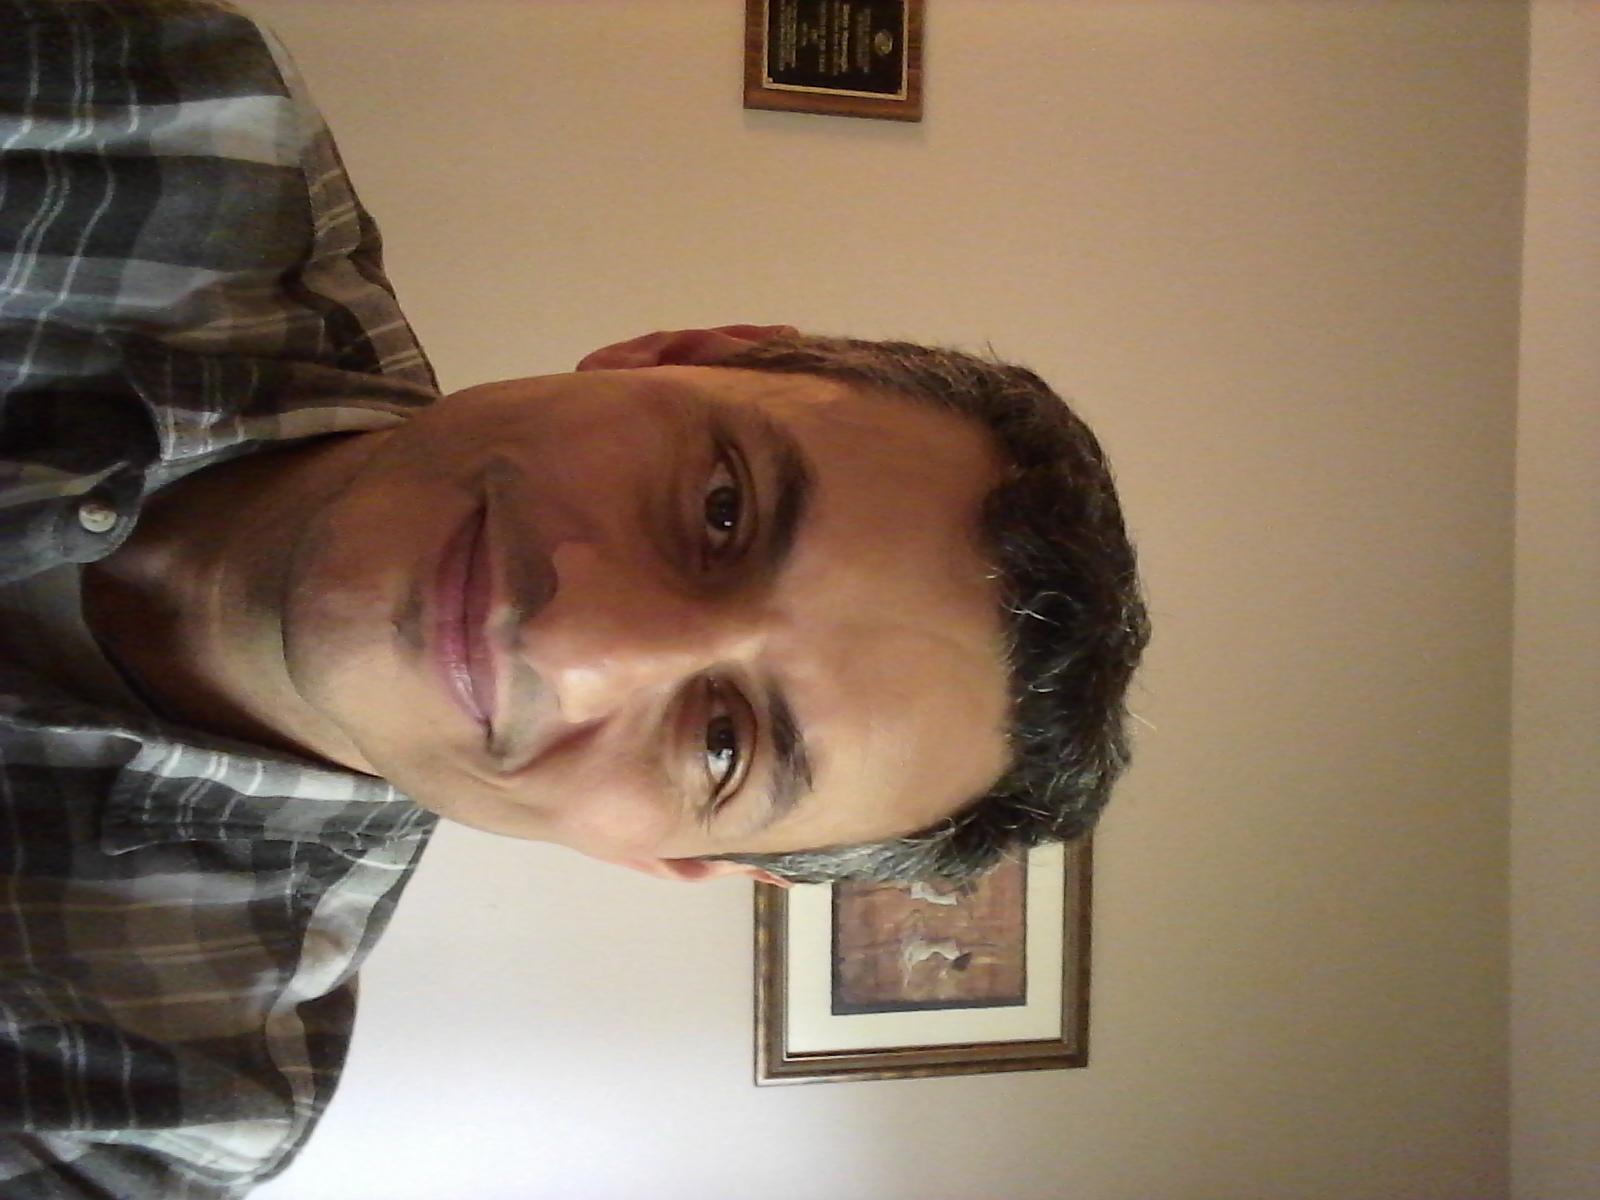 Siamak Vossoughi